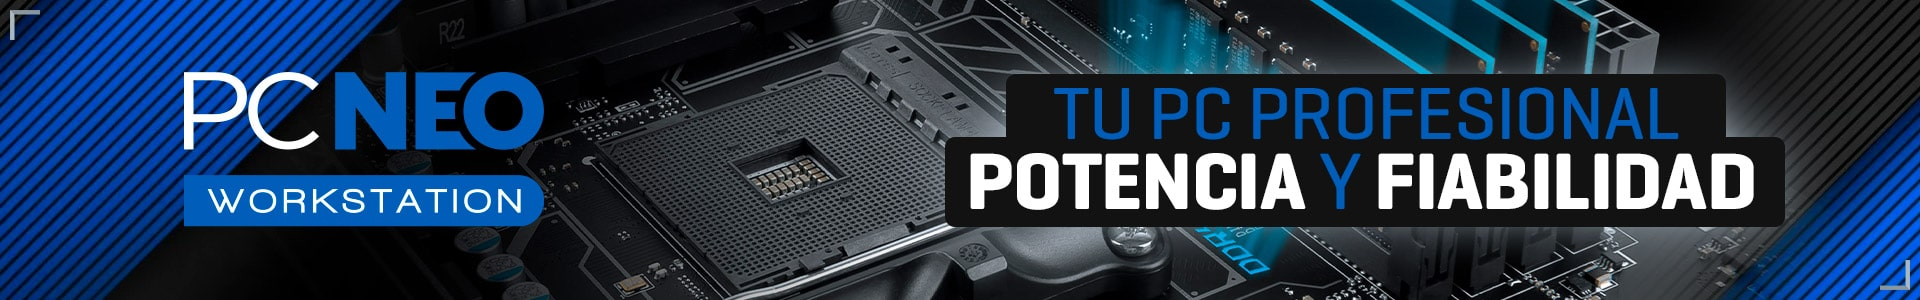 PC NEO Workstation : Tu PC profesional. Potencia y fiabilidad